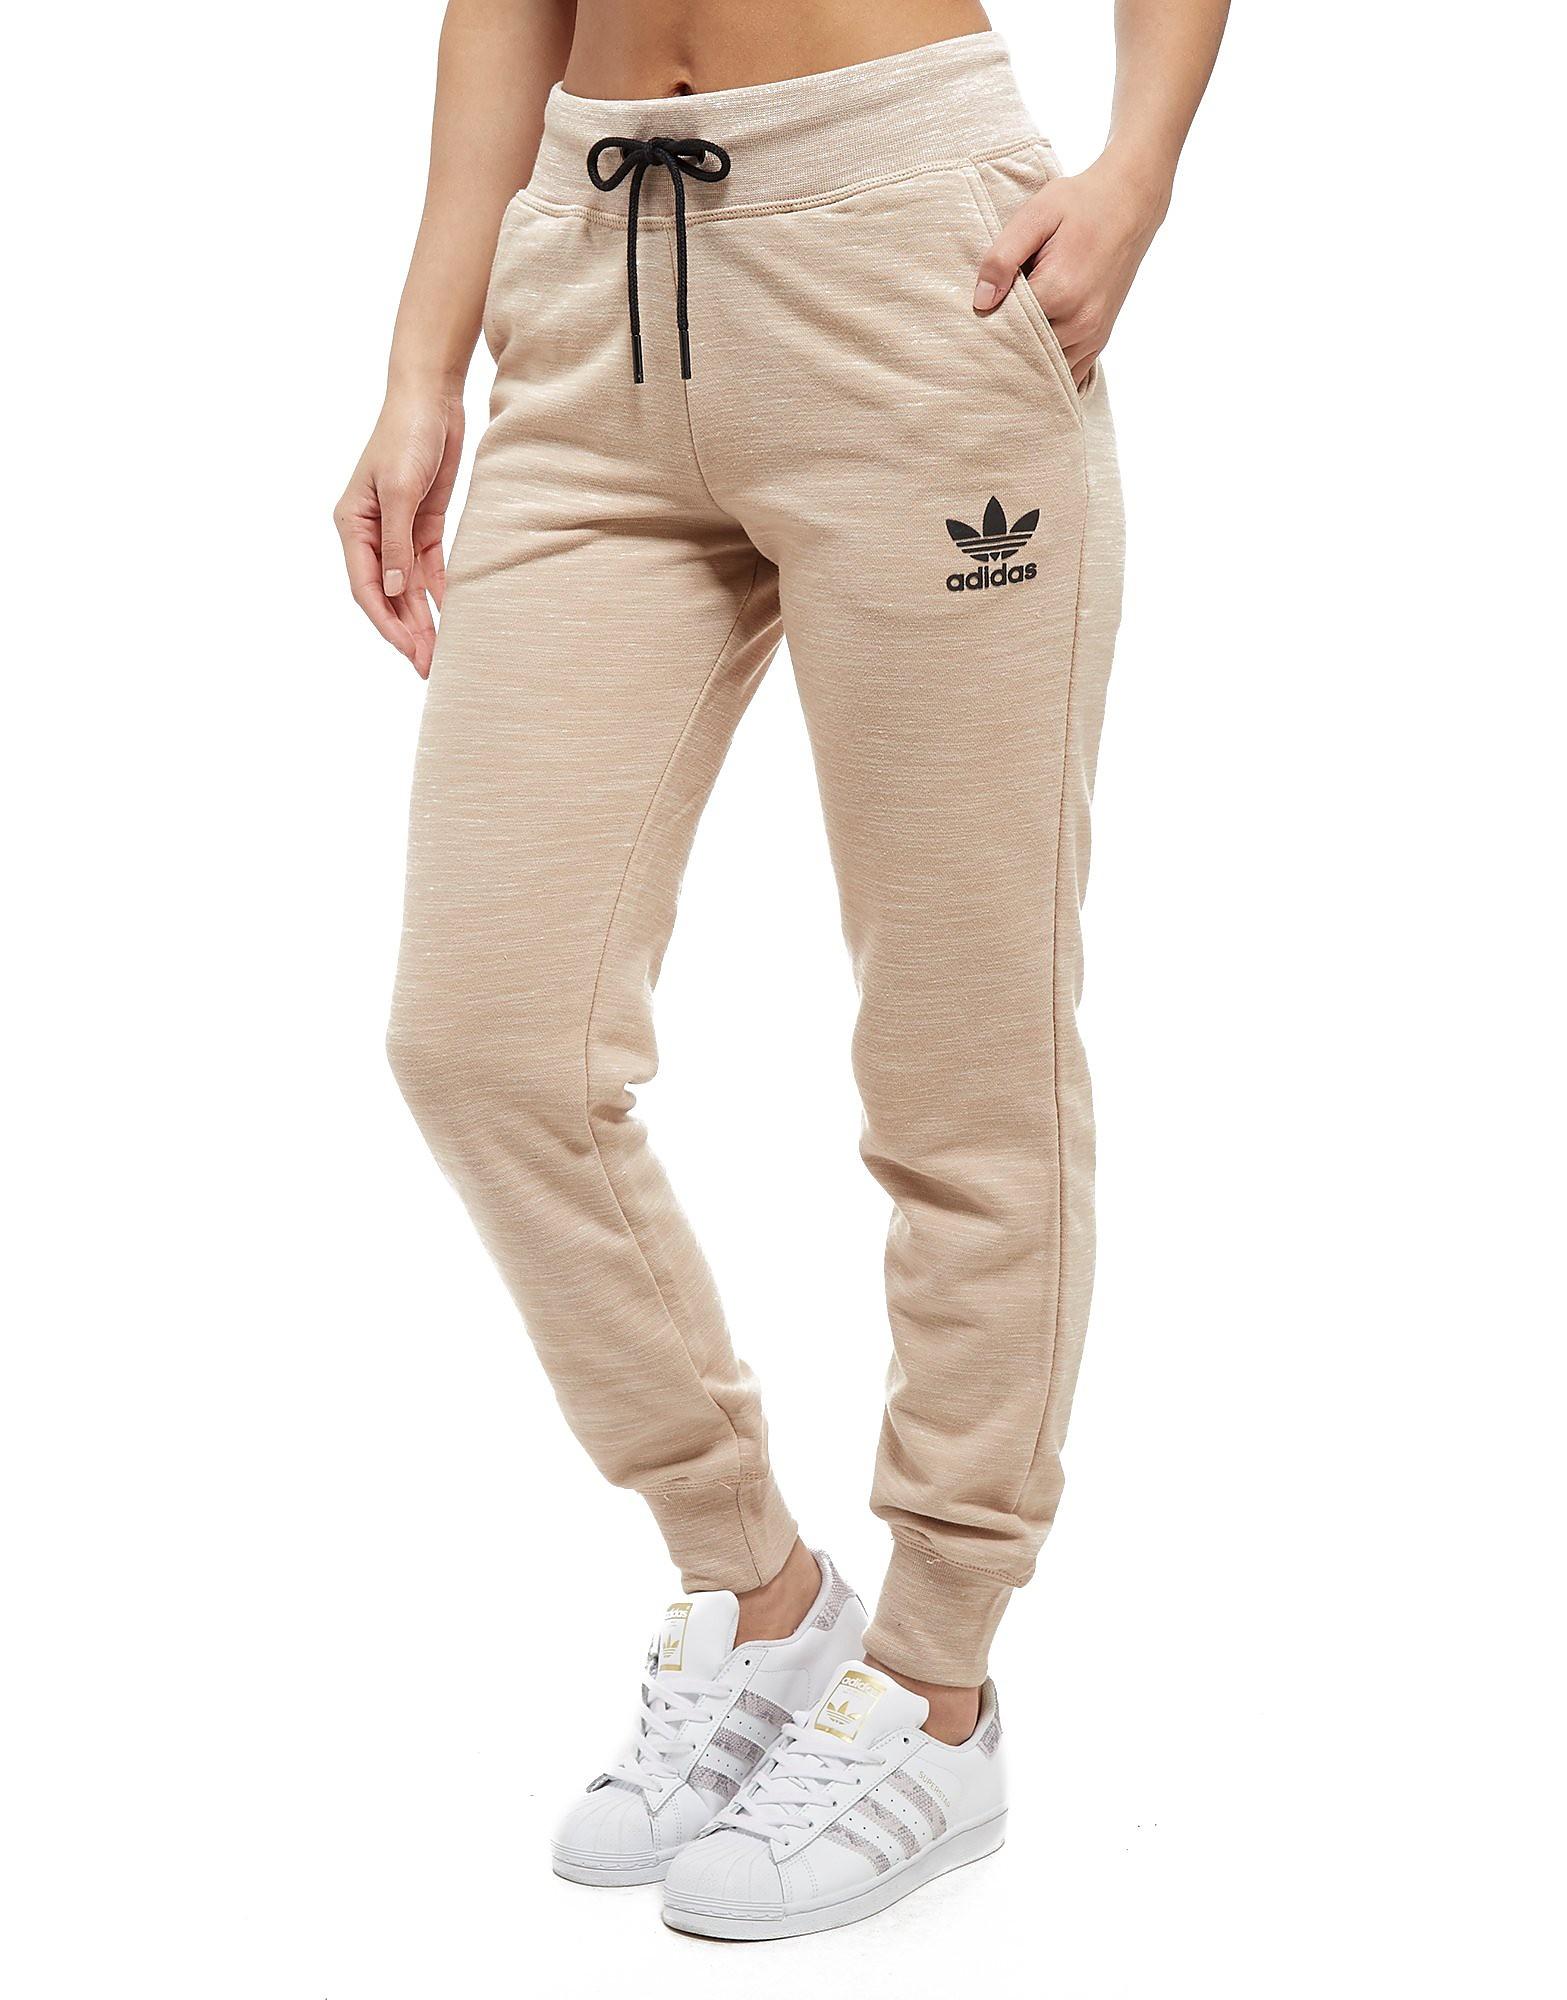 adidas Originals pantalón Premium Spacedye